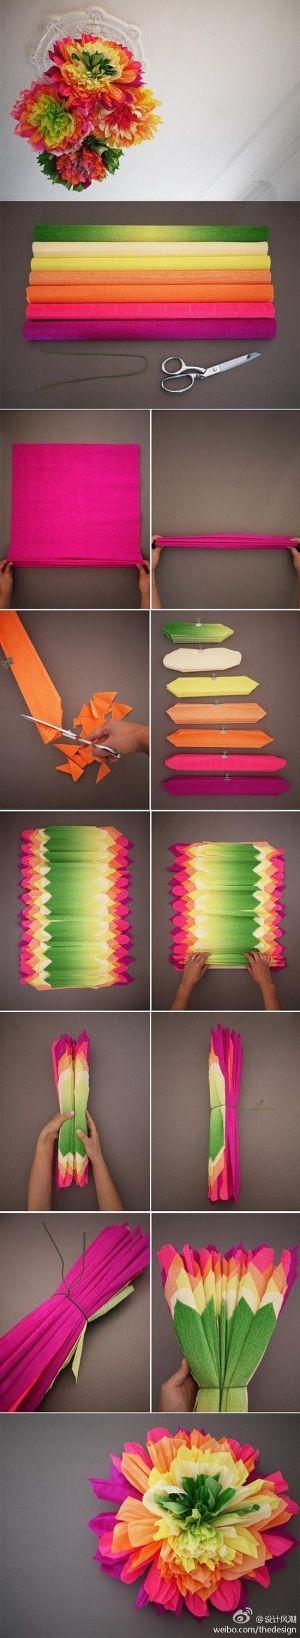 DIY Krepppapier Blumen